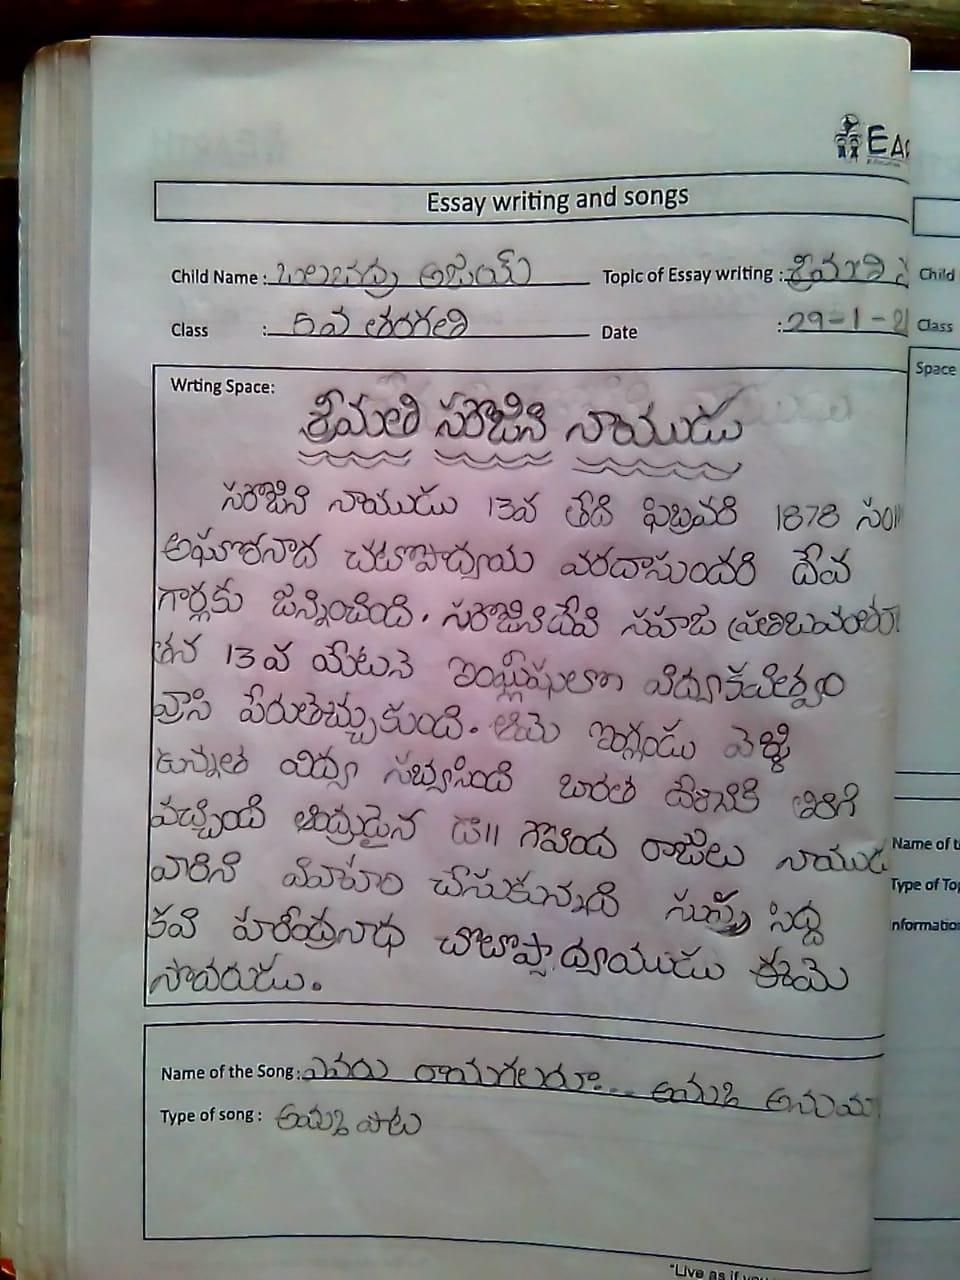 About Sarojini Naidu by a 5th grader